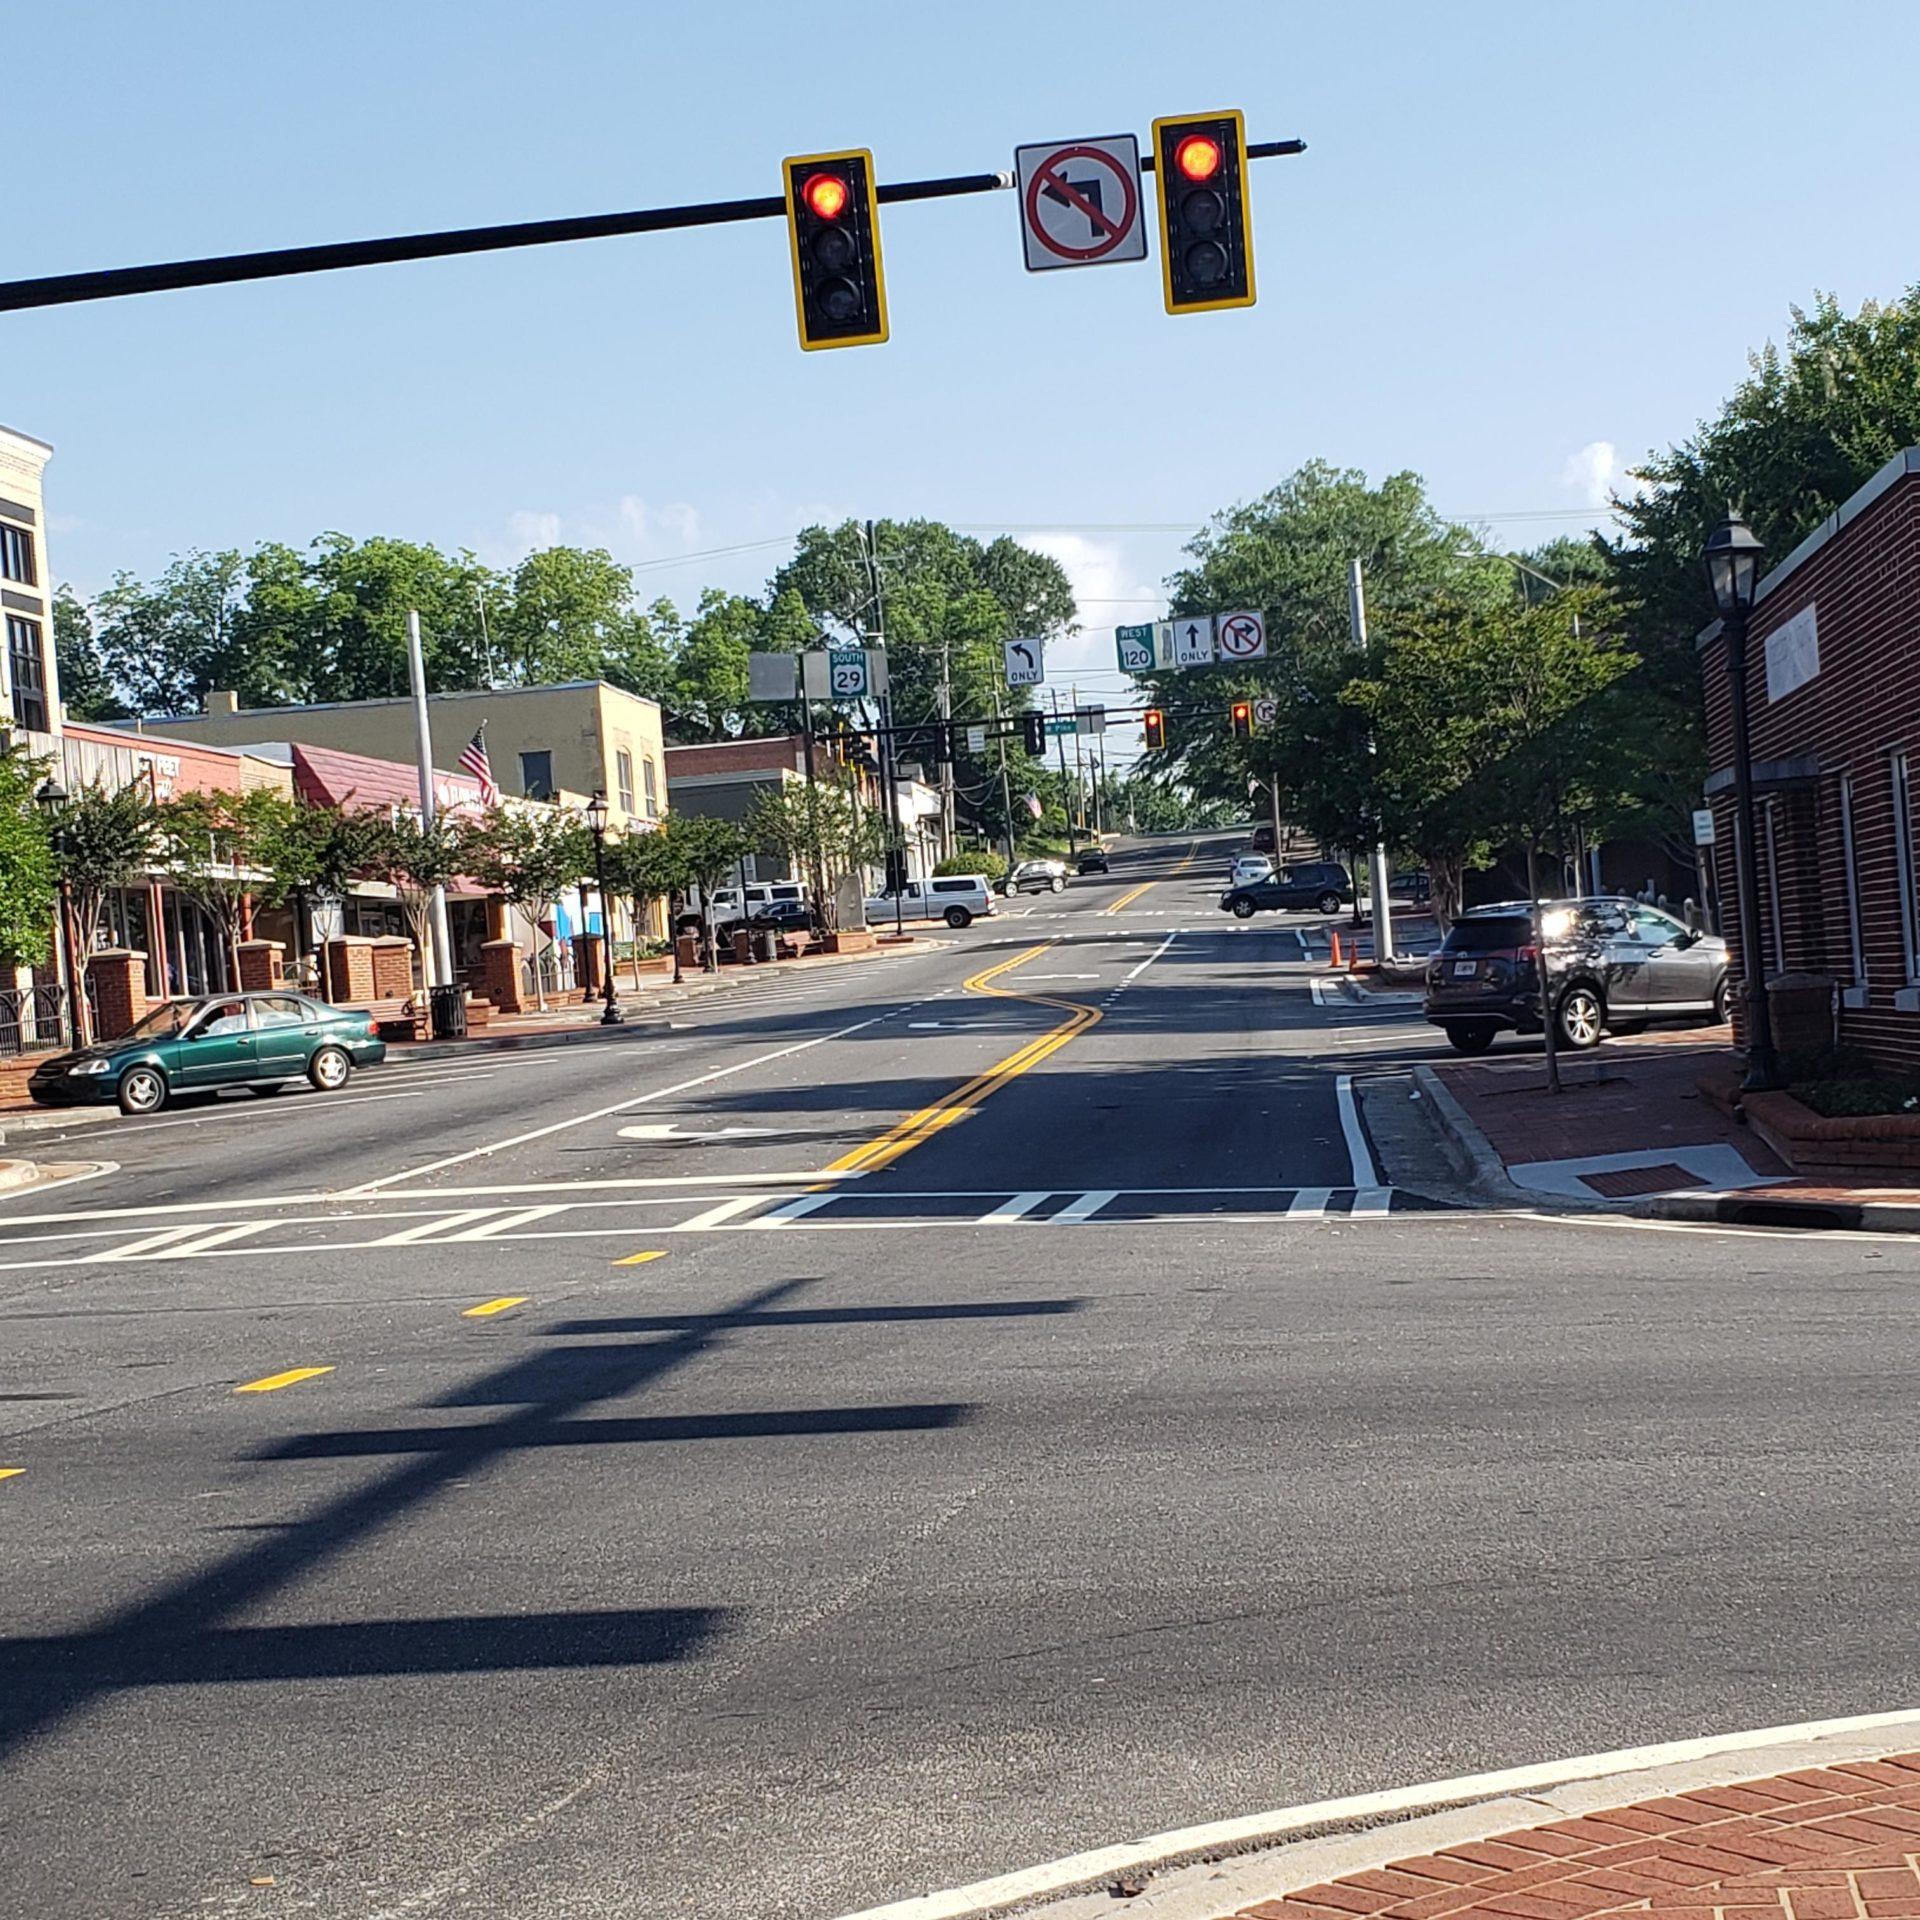 Danny the Street filming location Lithonia, Georgia